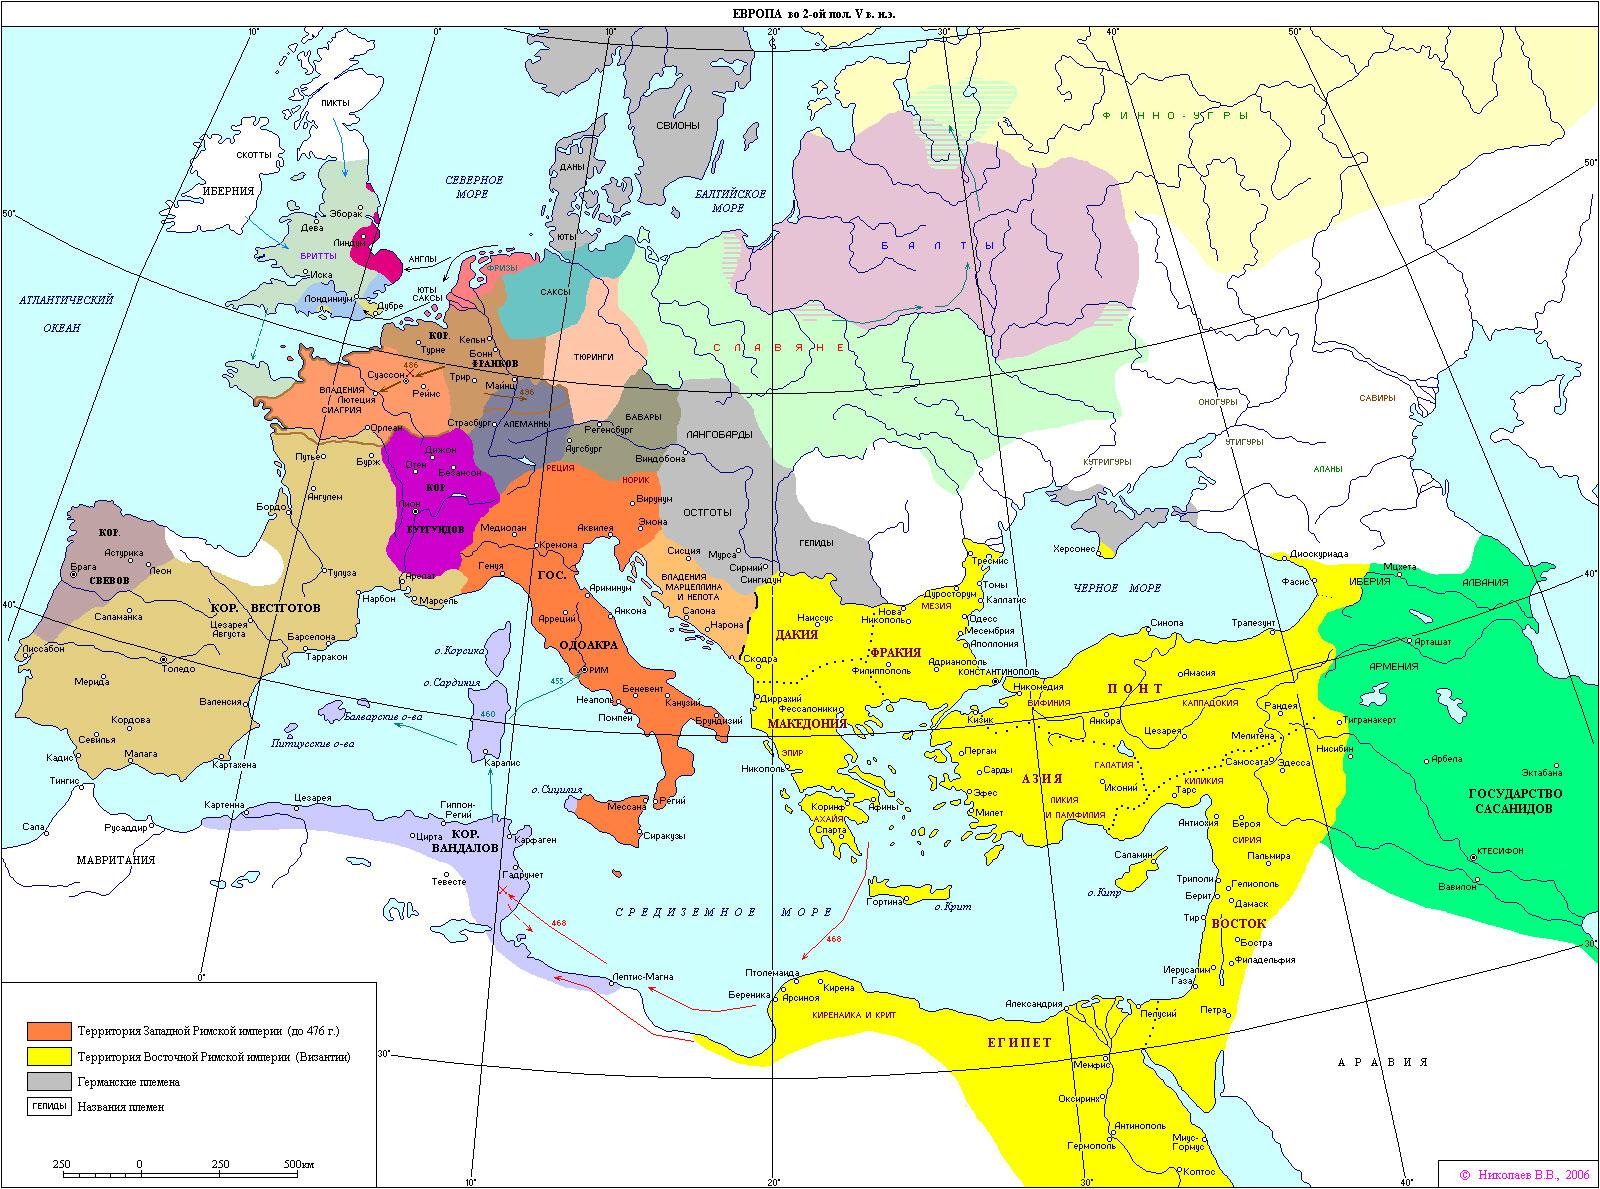 Древний мир - Карты древнего Рима - III: http://rome.3dn.ru/index/karty_drevnego_rima_iii/0-37